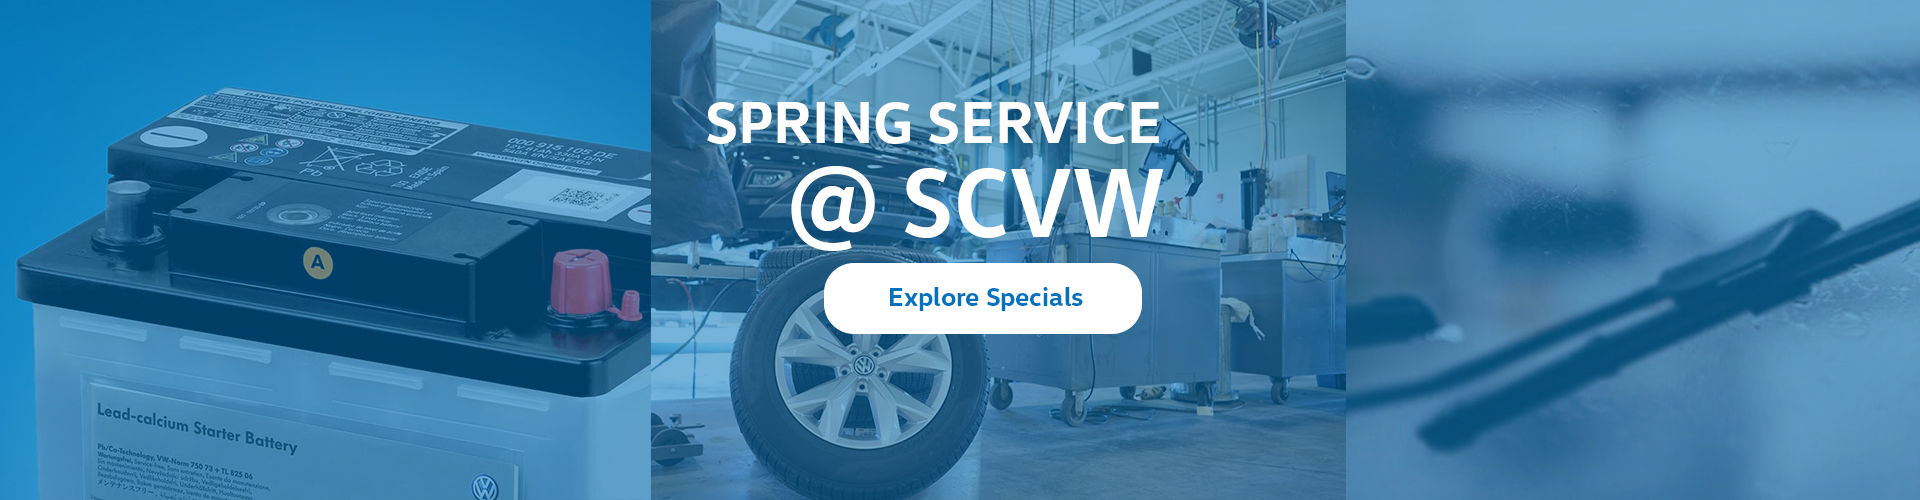 Spring Service Specials - South